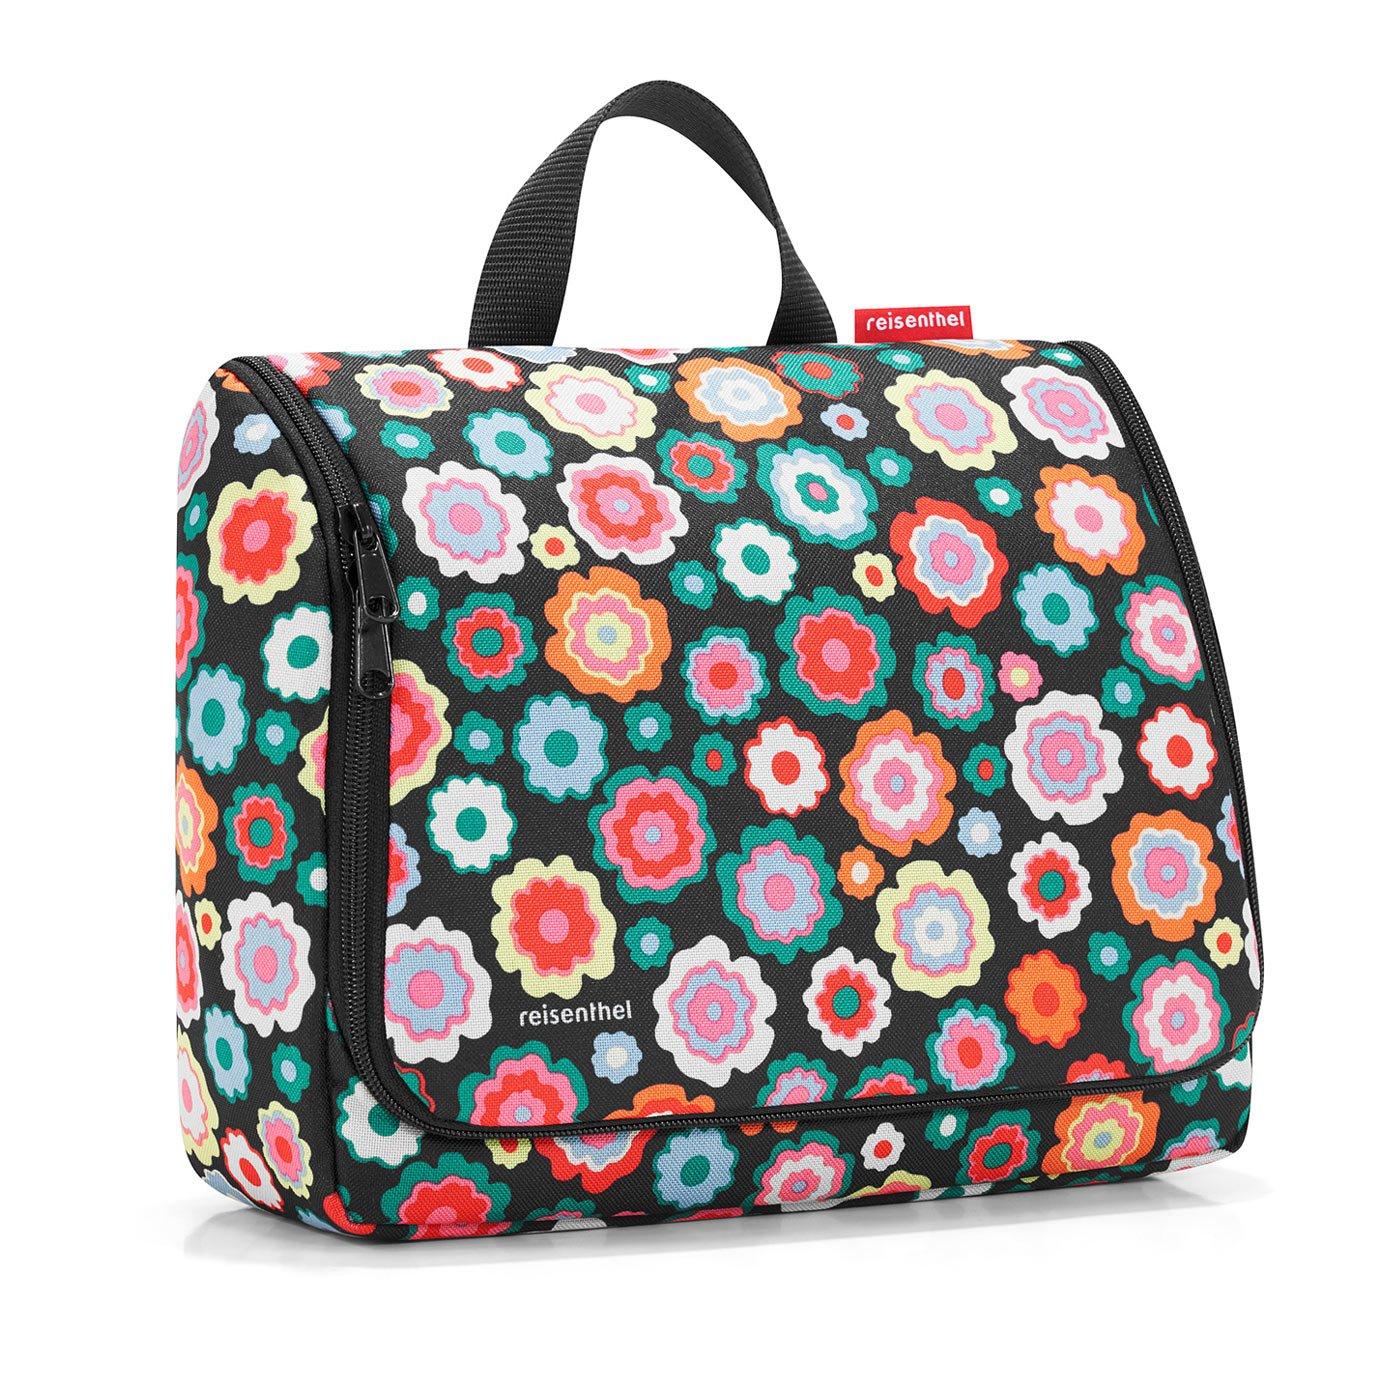 Reisenthel toiletbag XL Kosmetikkoffer, 28 cm, 4 L, Diamonds Mocha WO6039